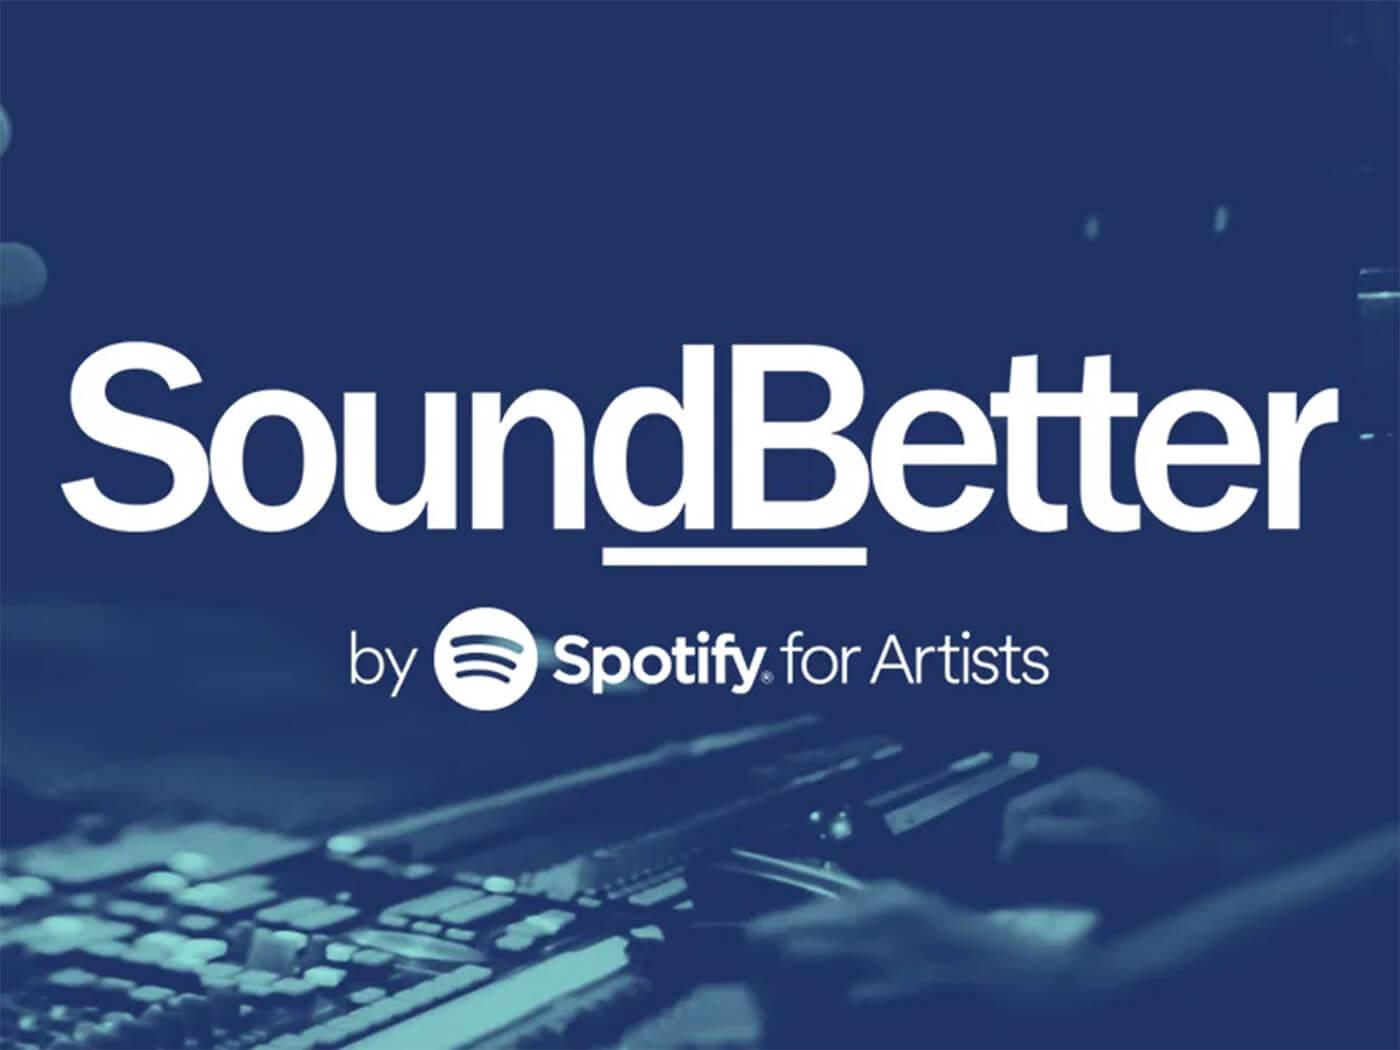 Spotify SoundBetter banner